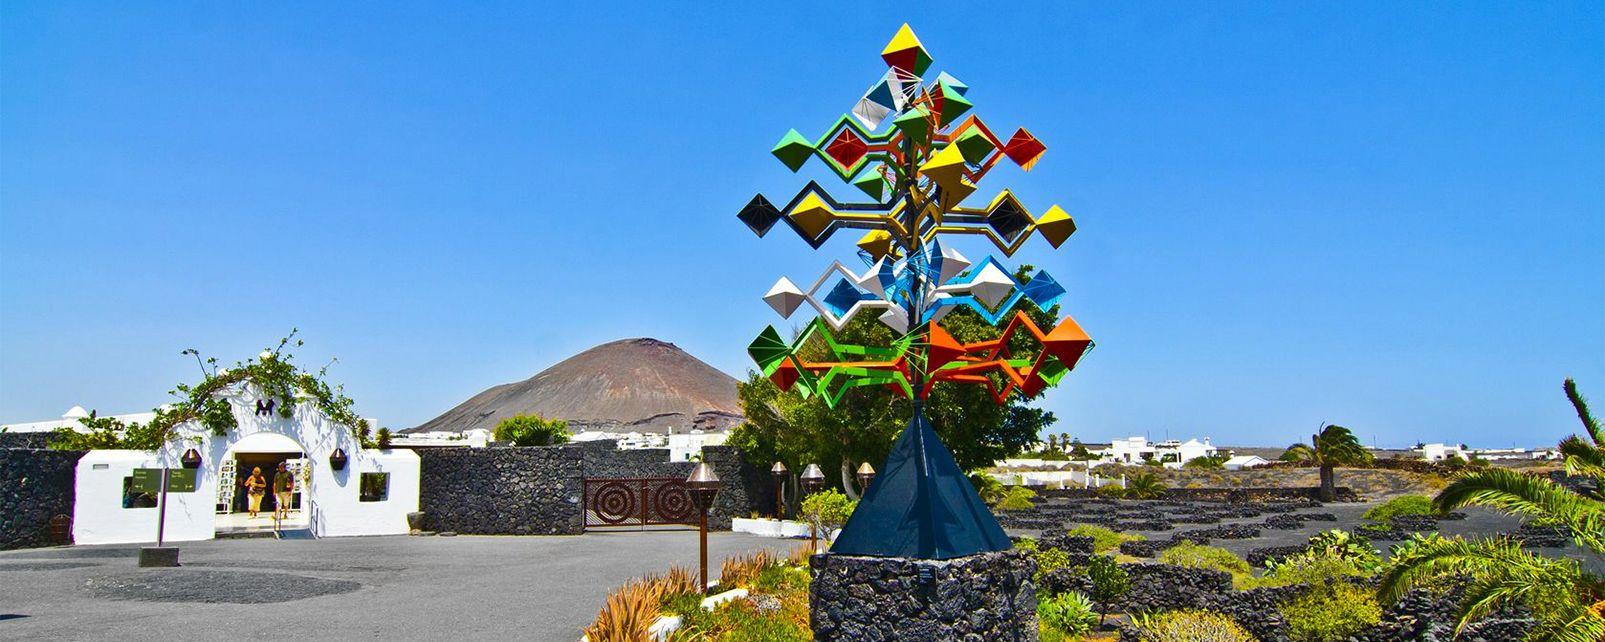 Lanzarote - La fondation César Manrique, Les arts et la culture, Canaries